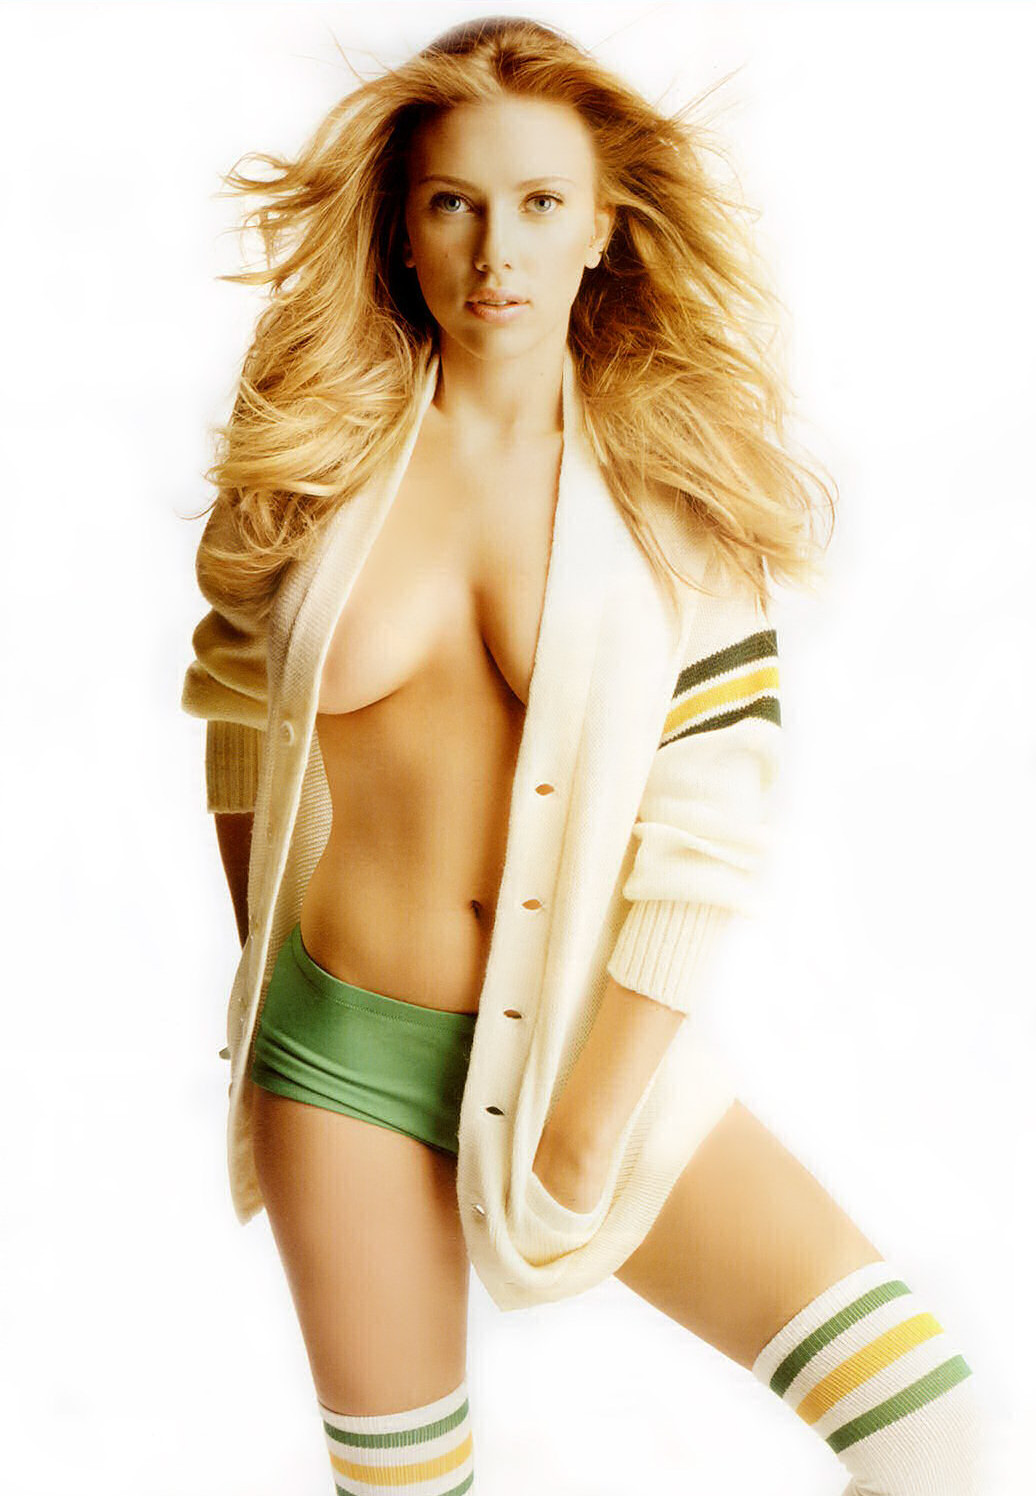 Scarlet johansson sexy